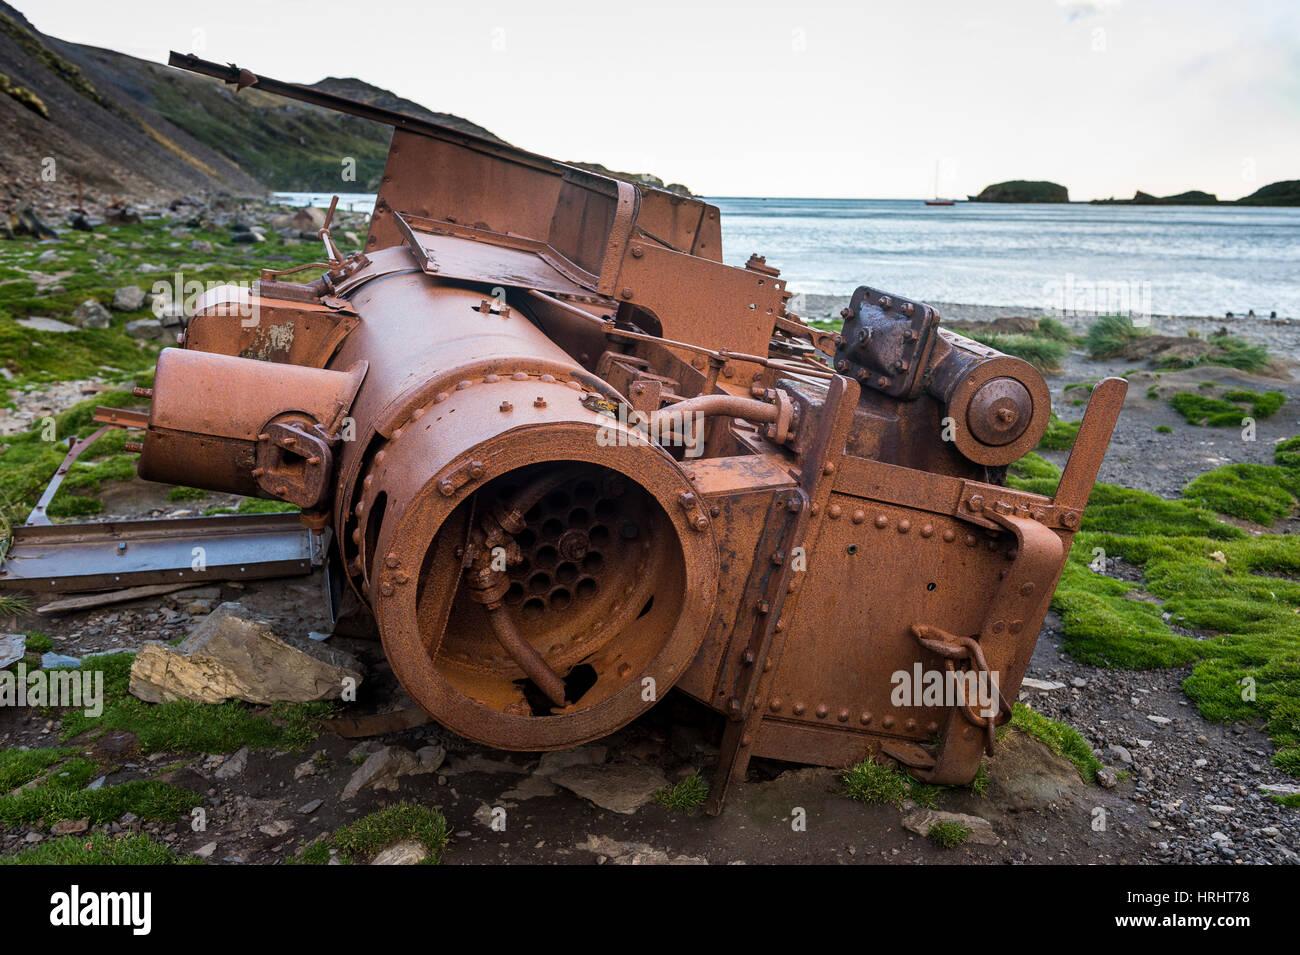 Rusty old steam train, Ocean Harbour, South Georgia, Antarctica, Polar Regions - Stock Image